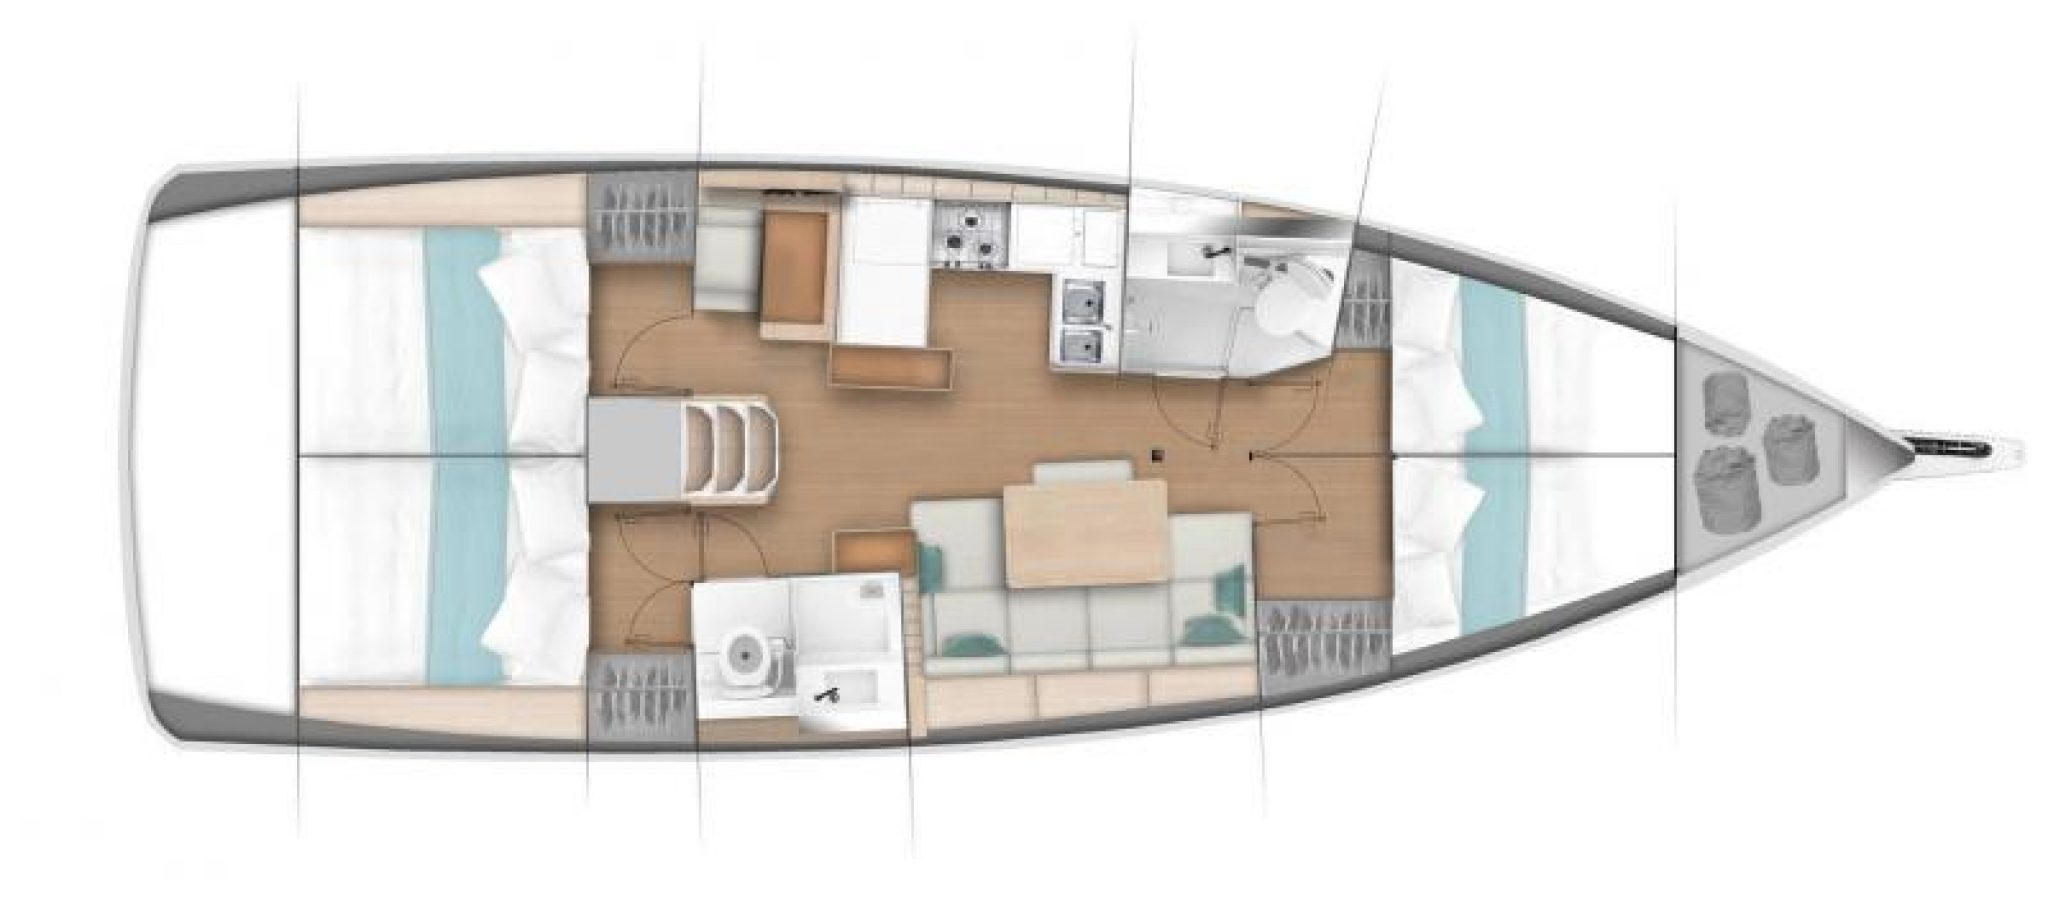 Sun Odyssey 440 plan 4 cabines